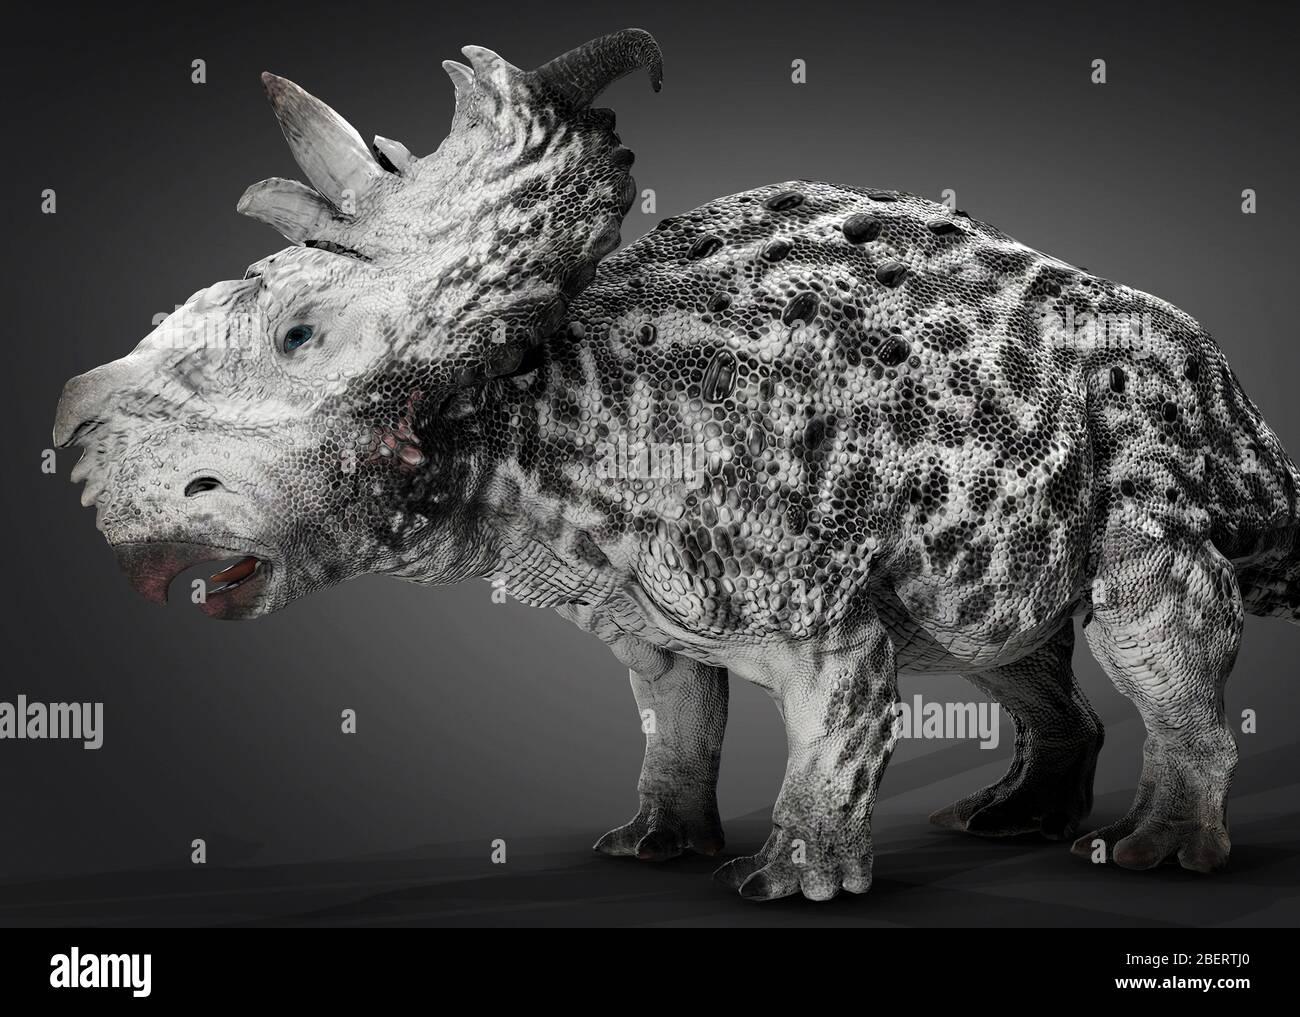 Dinosaurio Pachyrhinosaur, vista lateral sobre fondo gris. Foto de stock